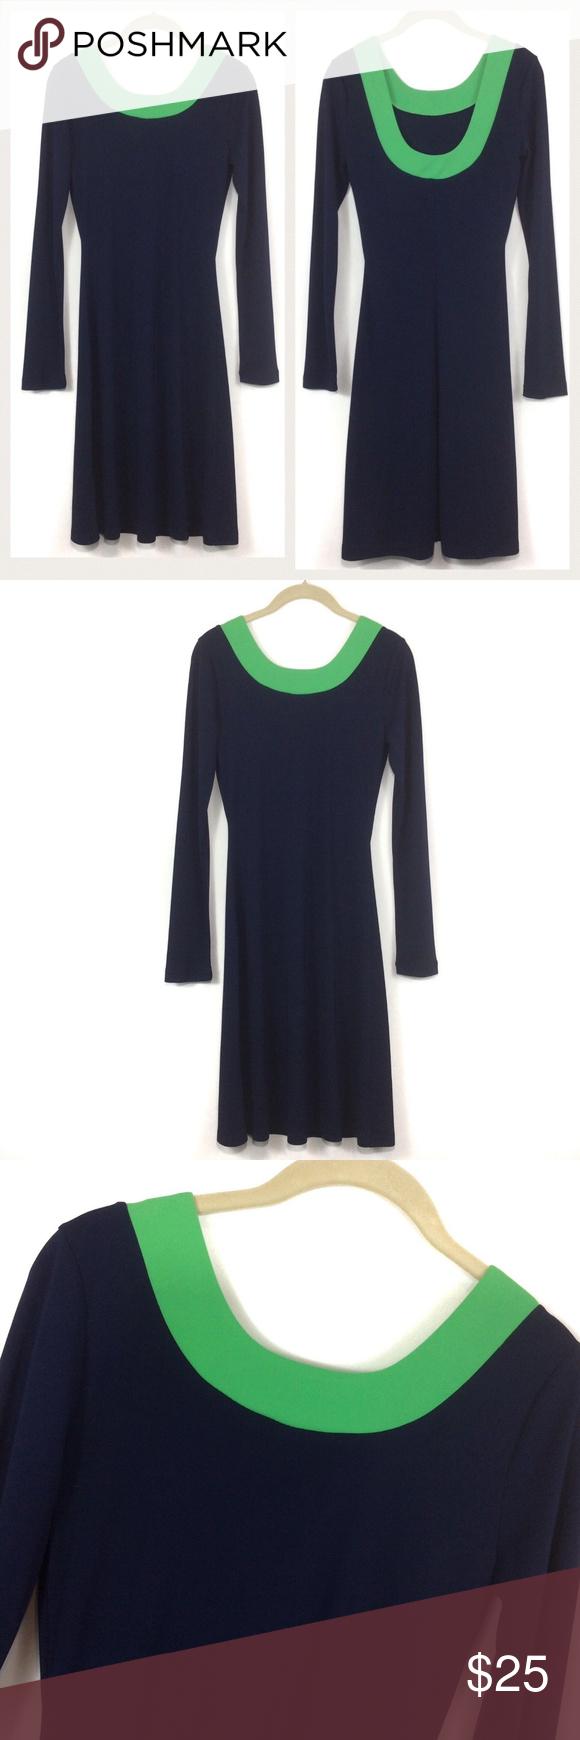 Isaac Mizrahi Target Scoop Back Navy Green Dress Green Long Sleeve Dress Navy And Green Clothes Design [ 1740 x 580 Pixel ]